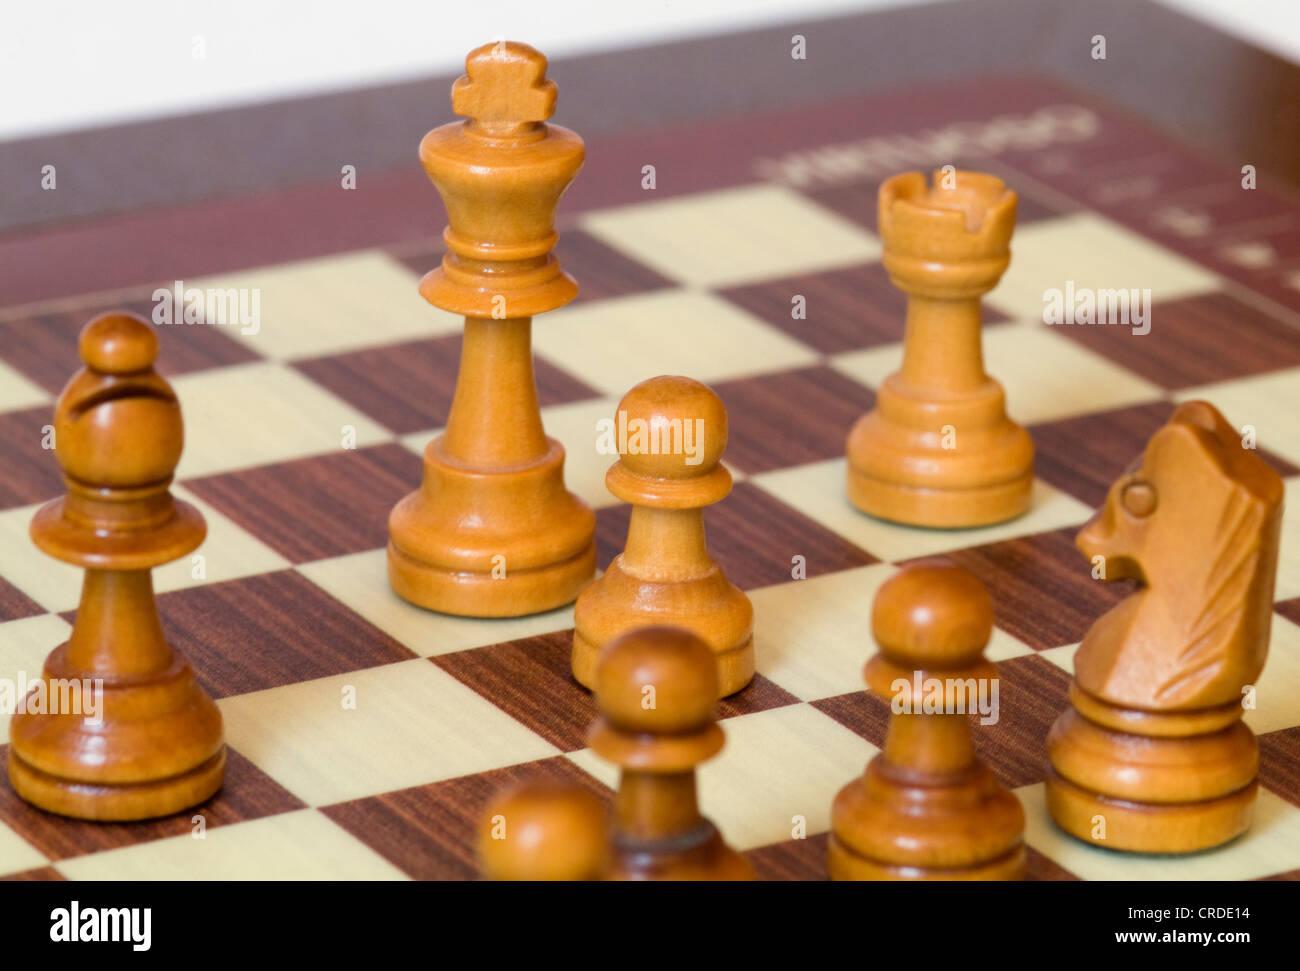 chessmen on chessboard - Stock Photo